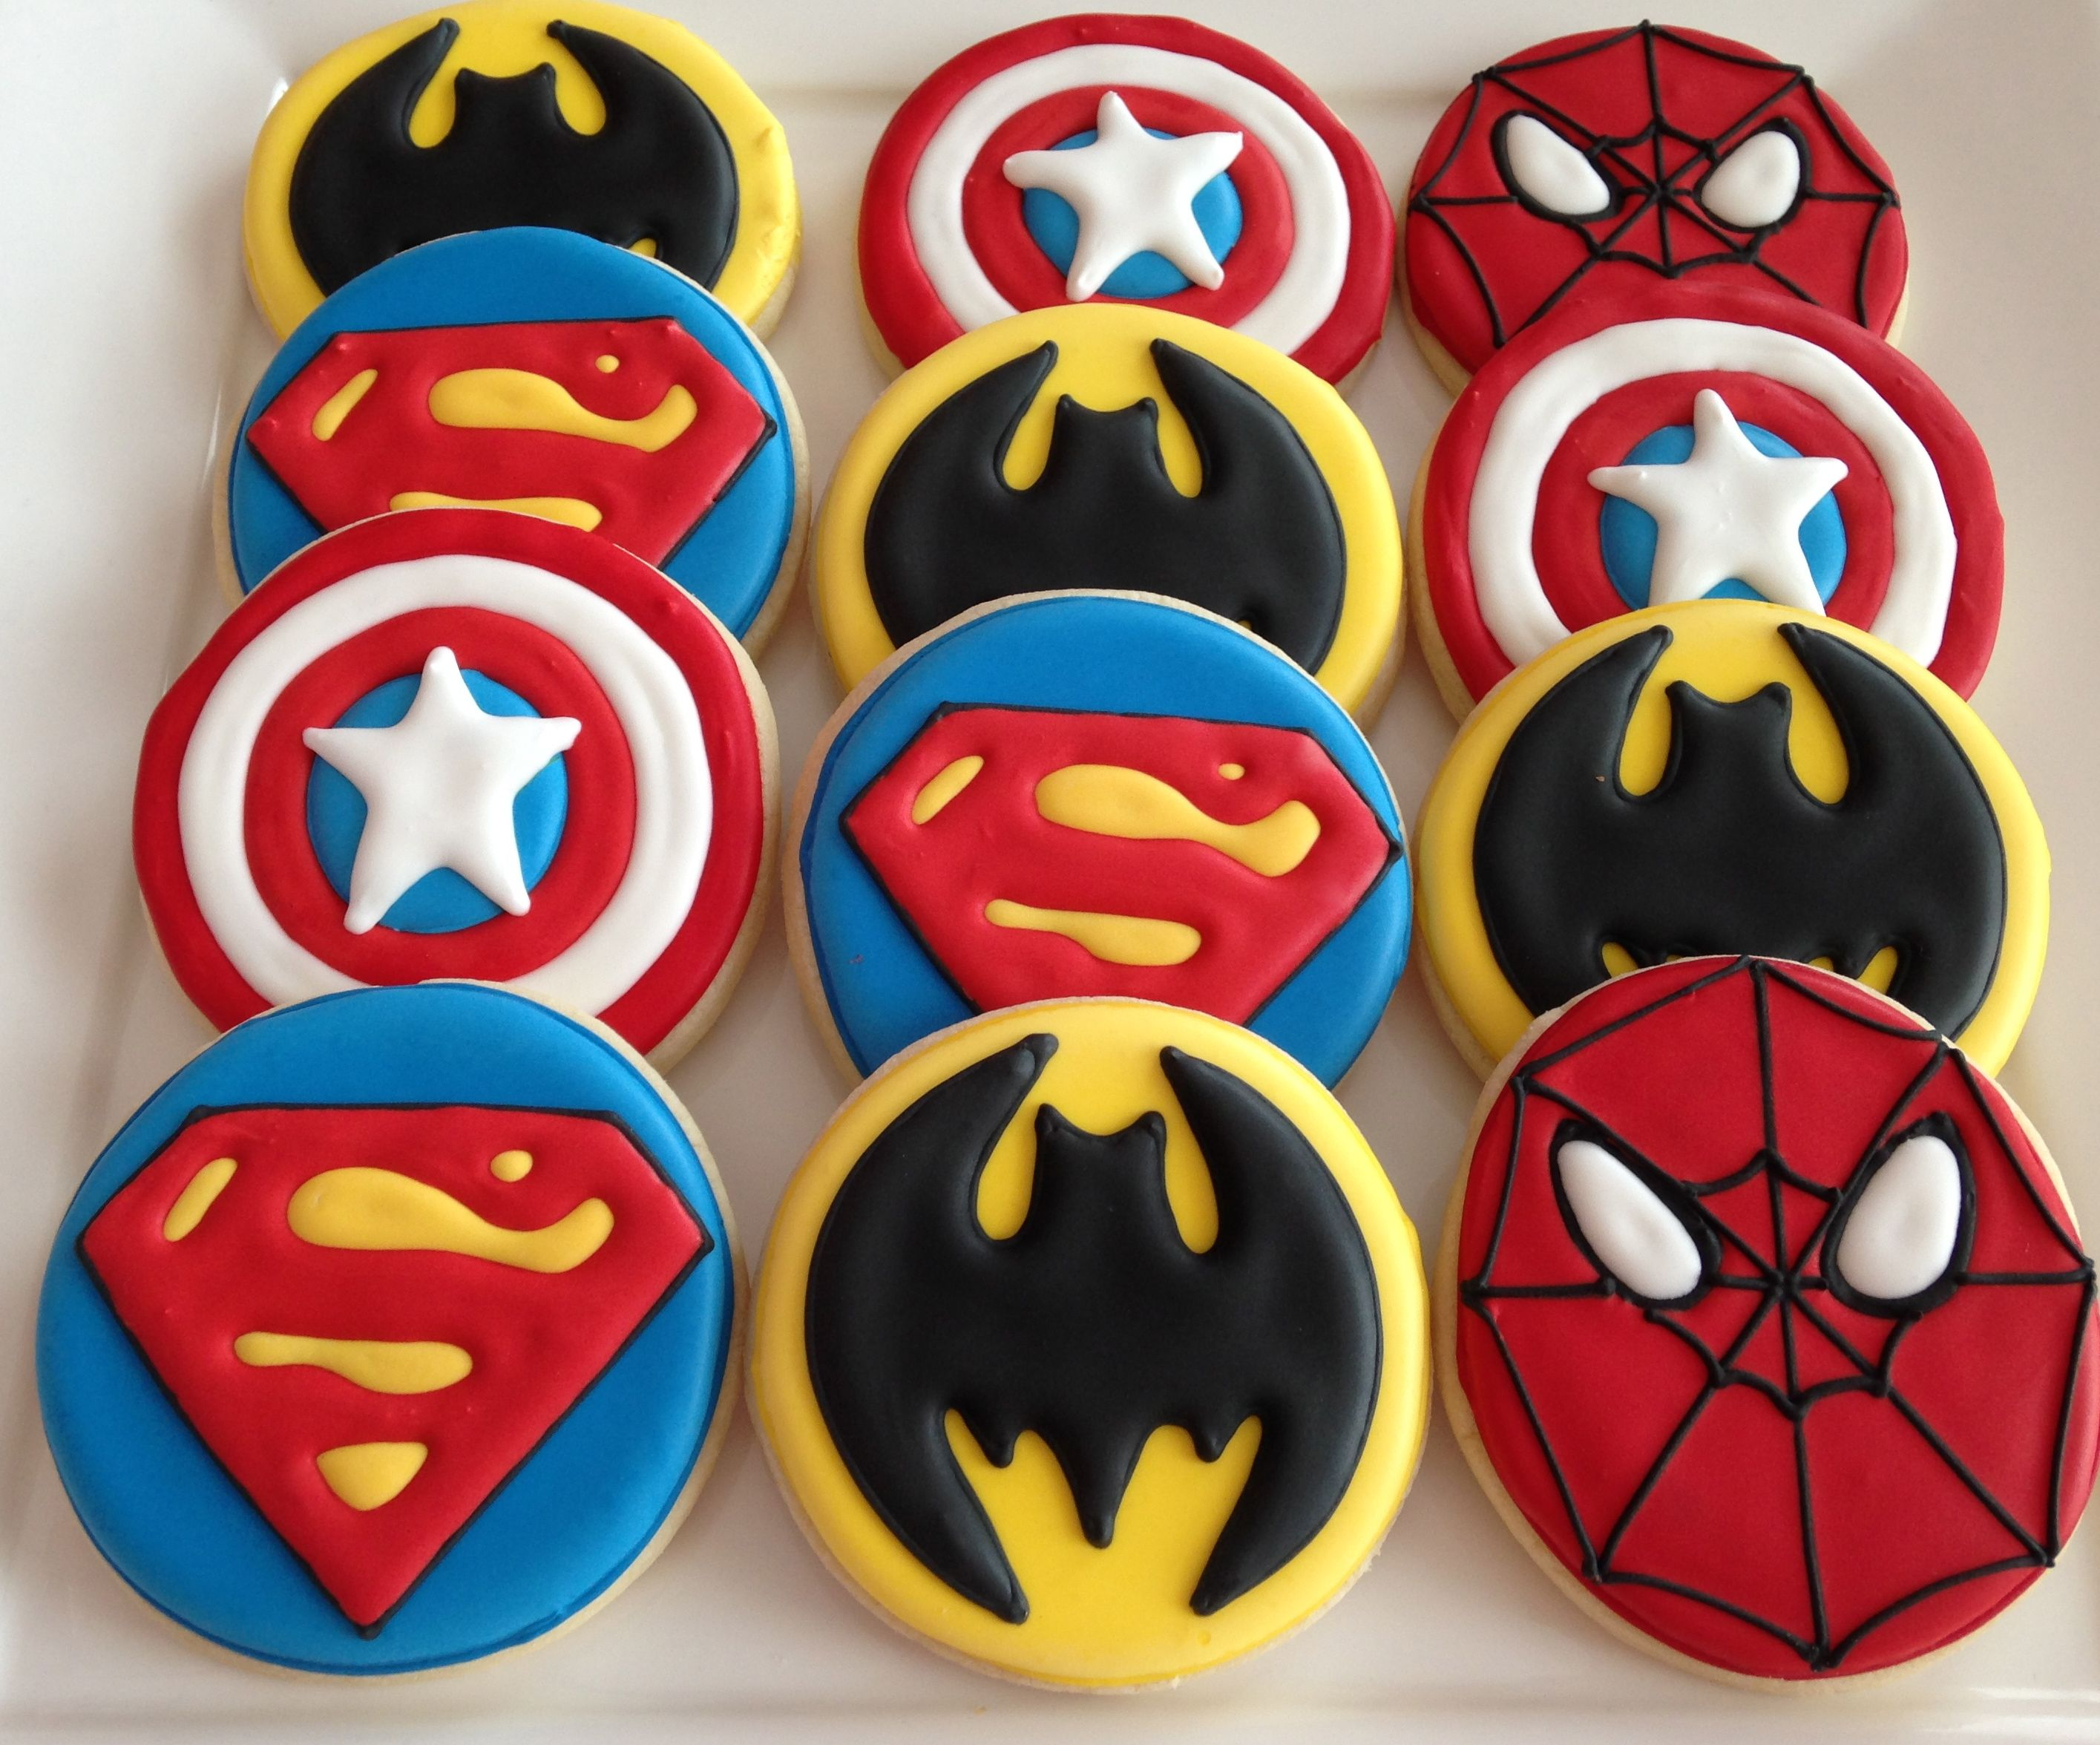 интересно подборка вафельница картинка на торт супер герои гуляев каждом мероприятии